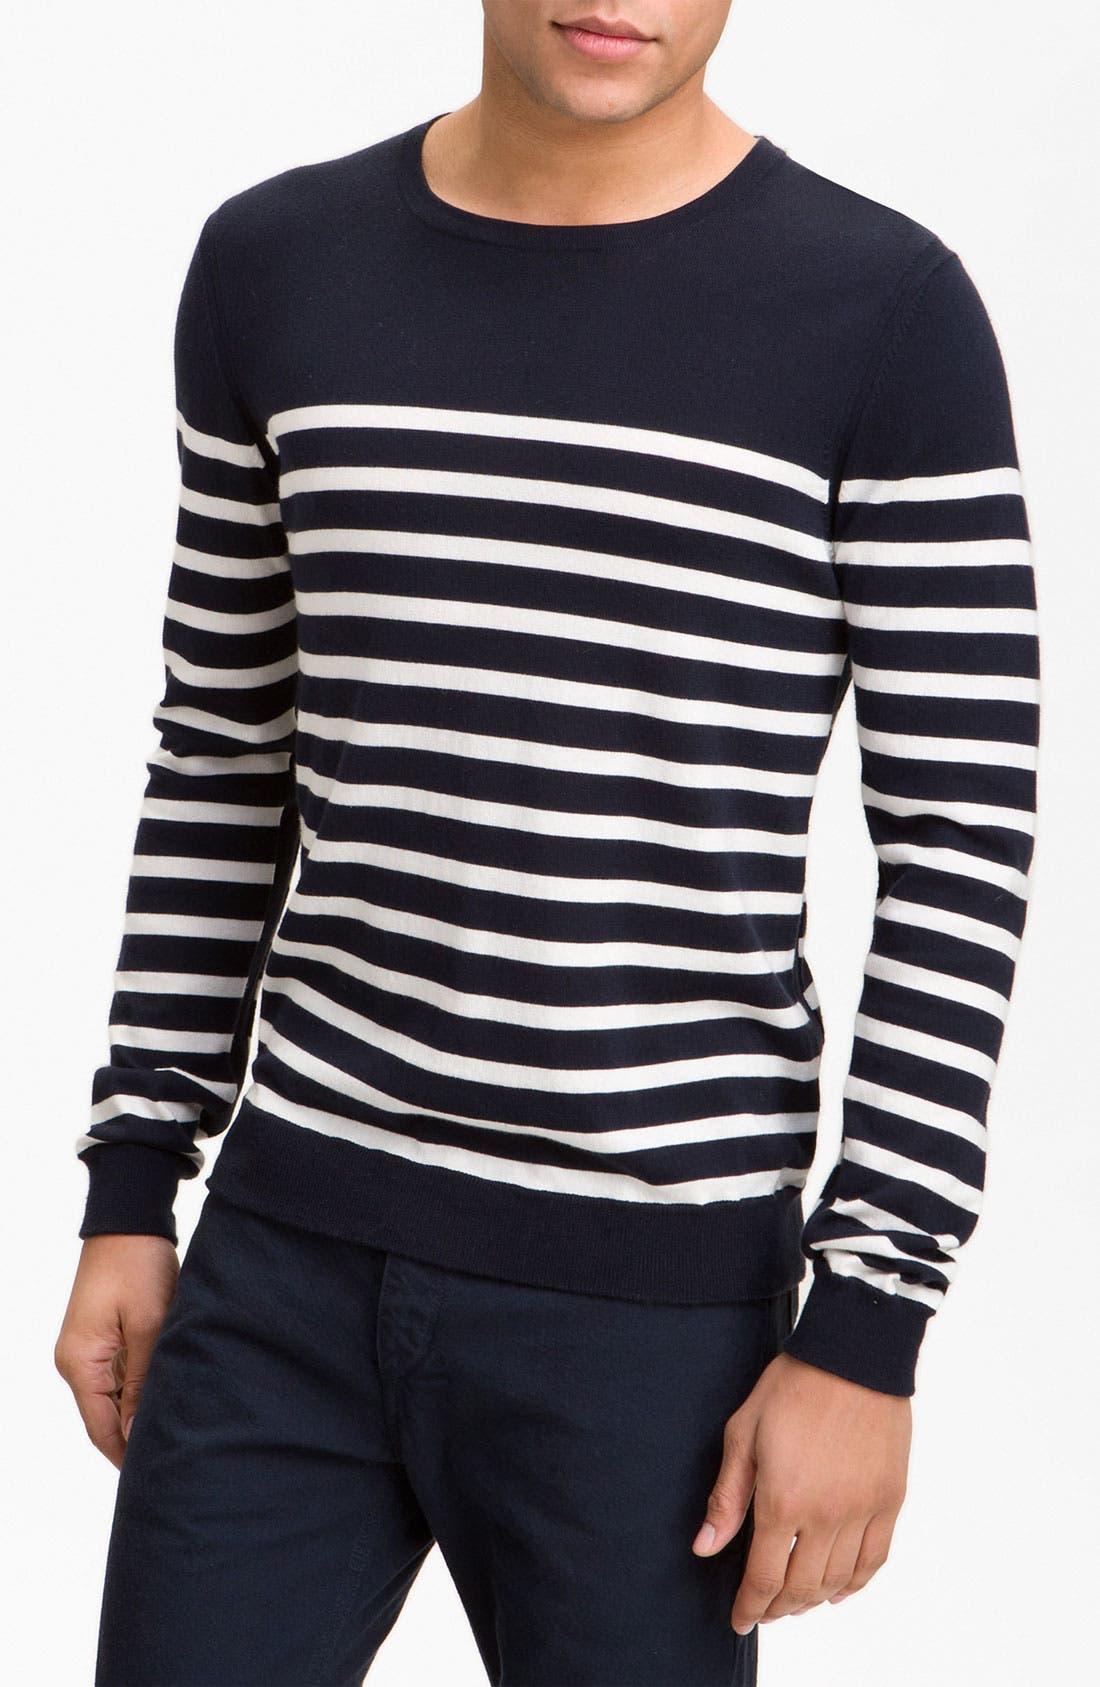 Main Image - rag & bone 'Basque' Crewneck Sweater